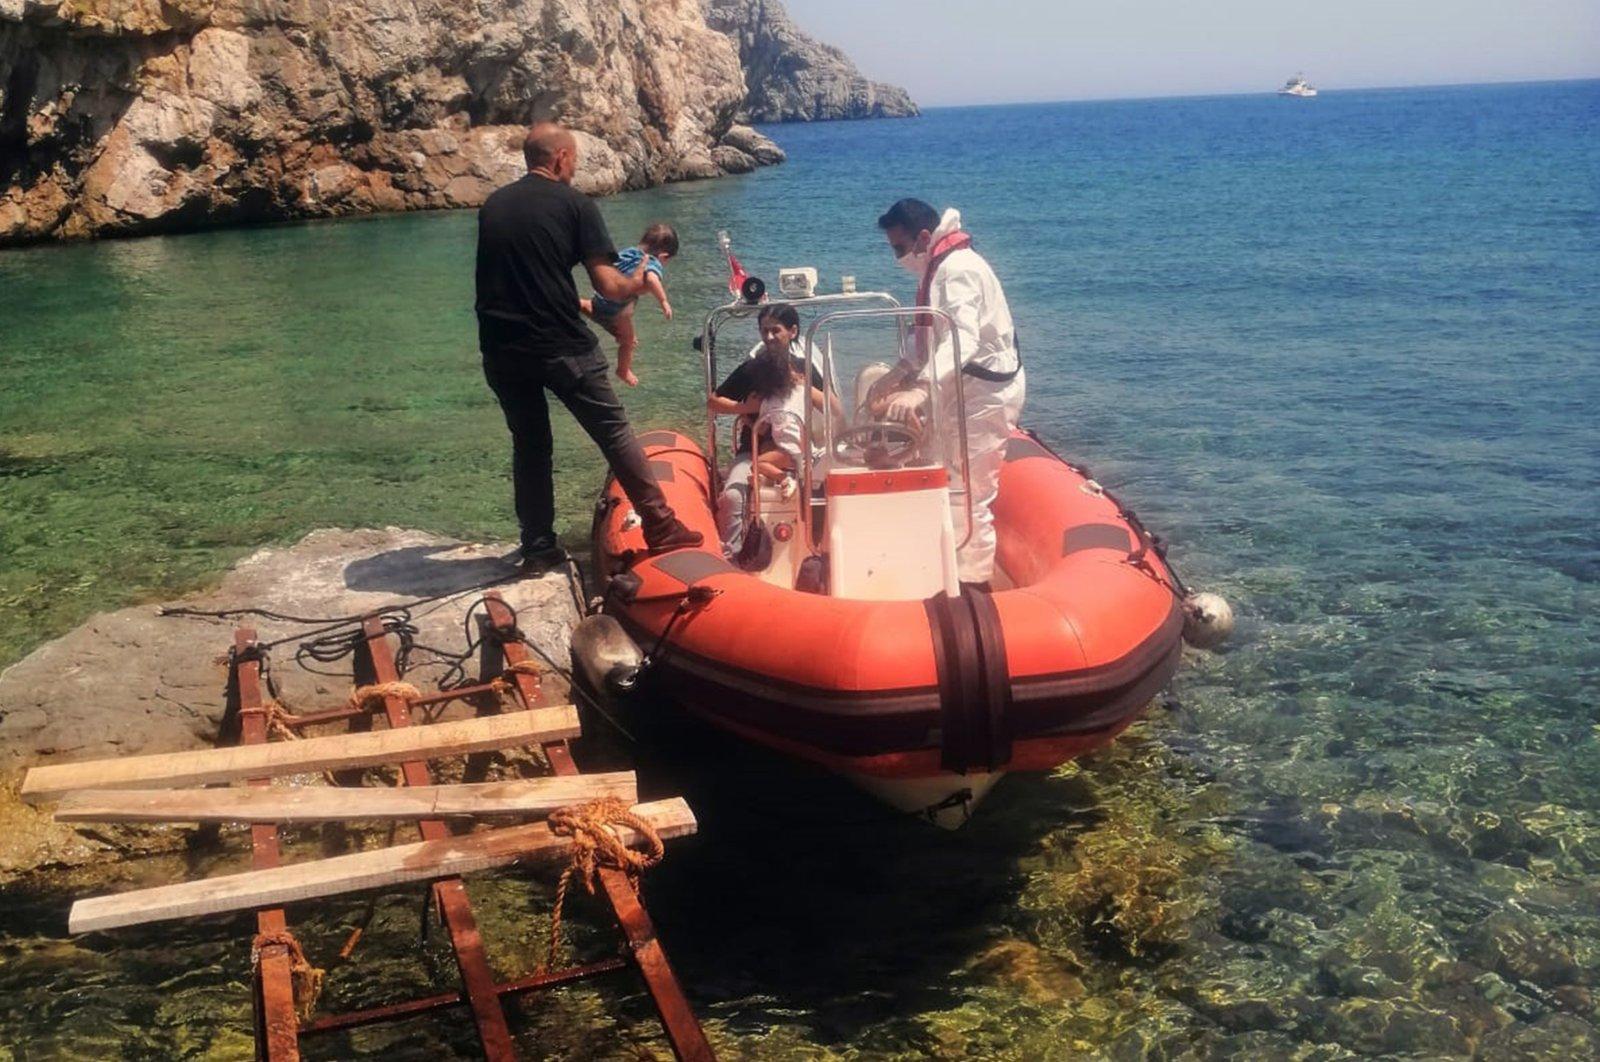 Eight migrants were rescued by Turkish coast guards in Çiftlik Bay of Marmaris district in southwestern Muğla province, Turkey, July 16, 2020. (IHA Photo)